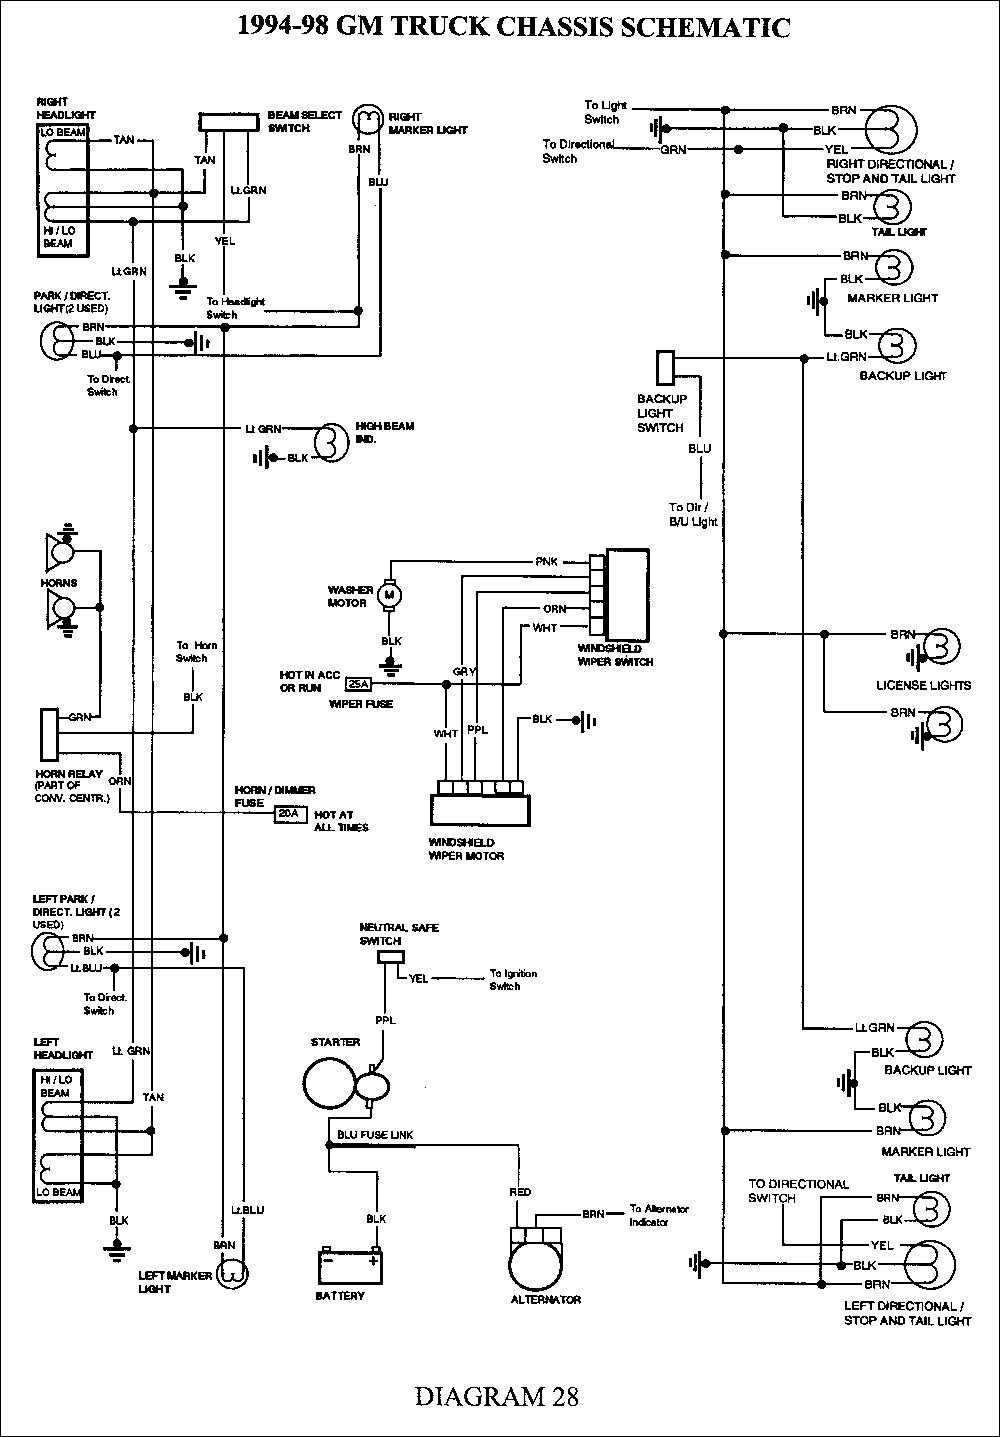 Trailblazer Tail Light Wiring Diagram | Wiring Diagram Image